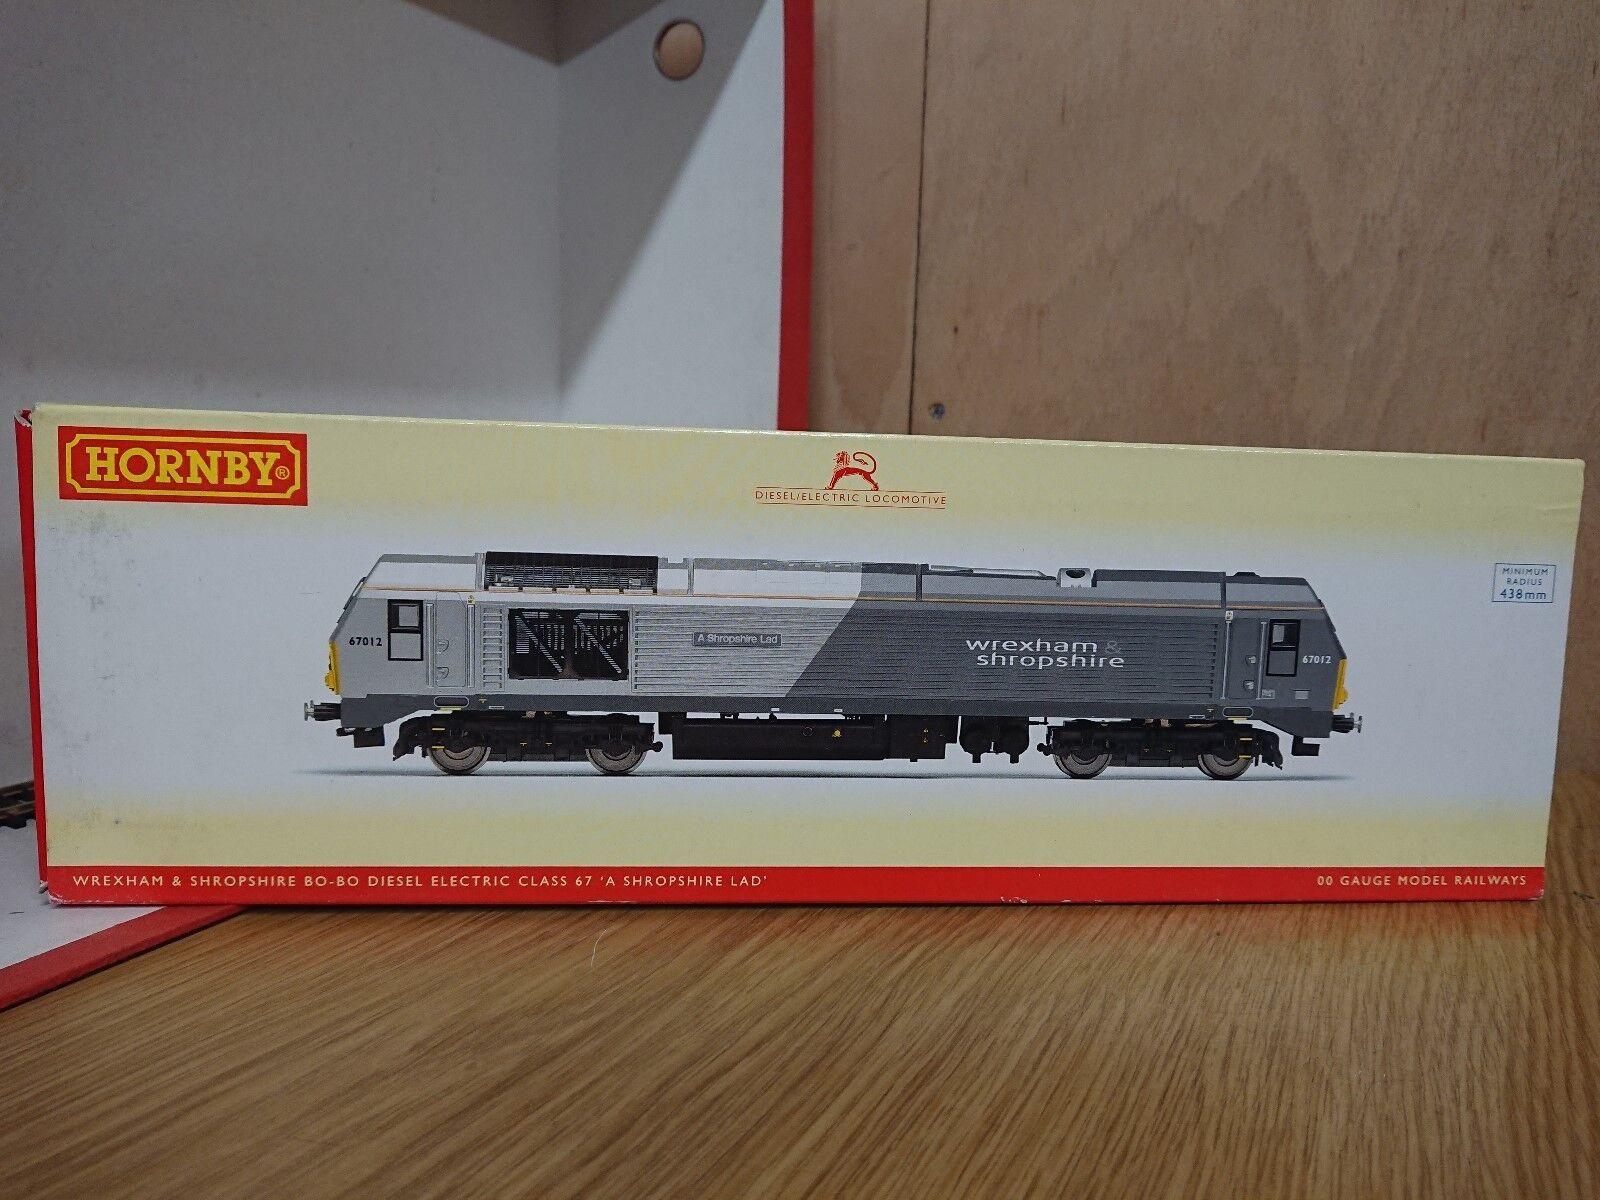 Hornby R3038 Wrexham & Shropshire Bo-Bo Diesel Electric Shropshire Lad DCC Ready